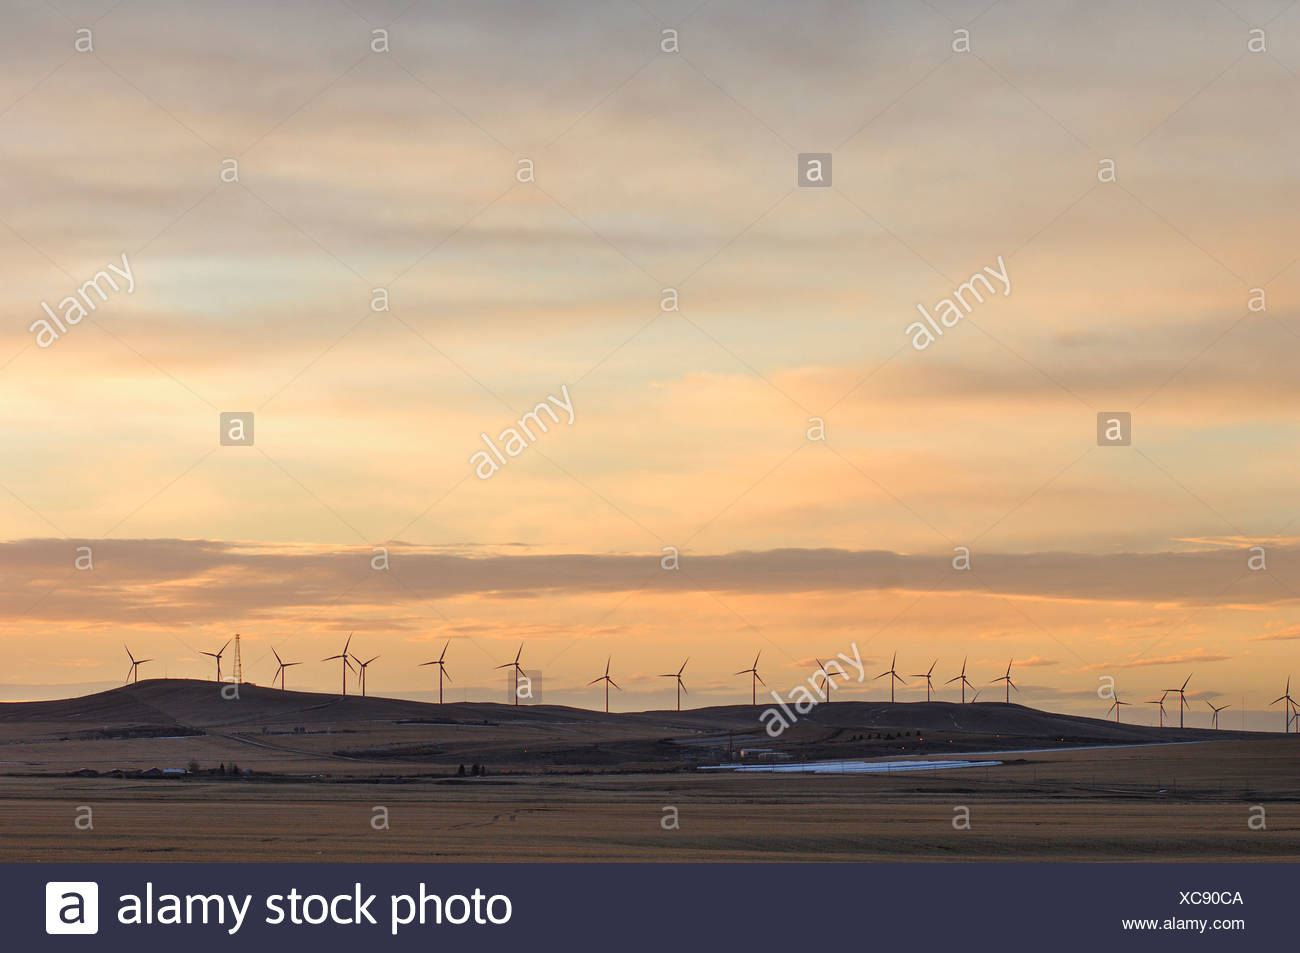 Canada Pincher Creek Alberta Wind Power Turbines Winter Wind Power Windmill Farm Generator Industry Energy Plant Landscape Dusk - Stock Image